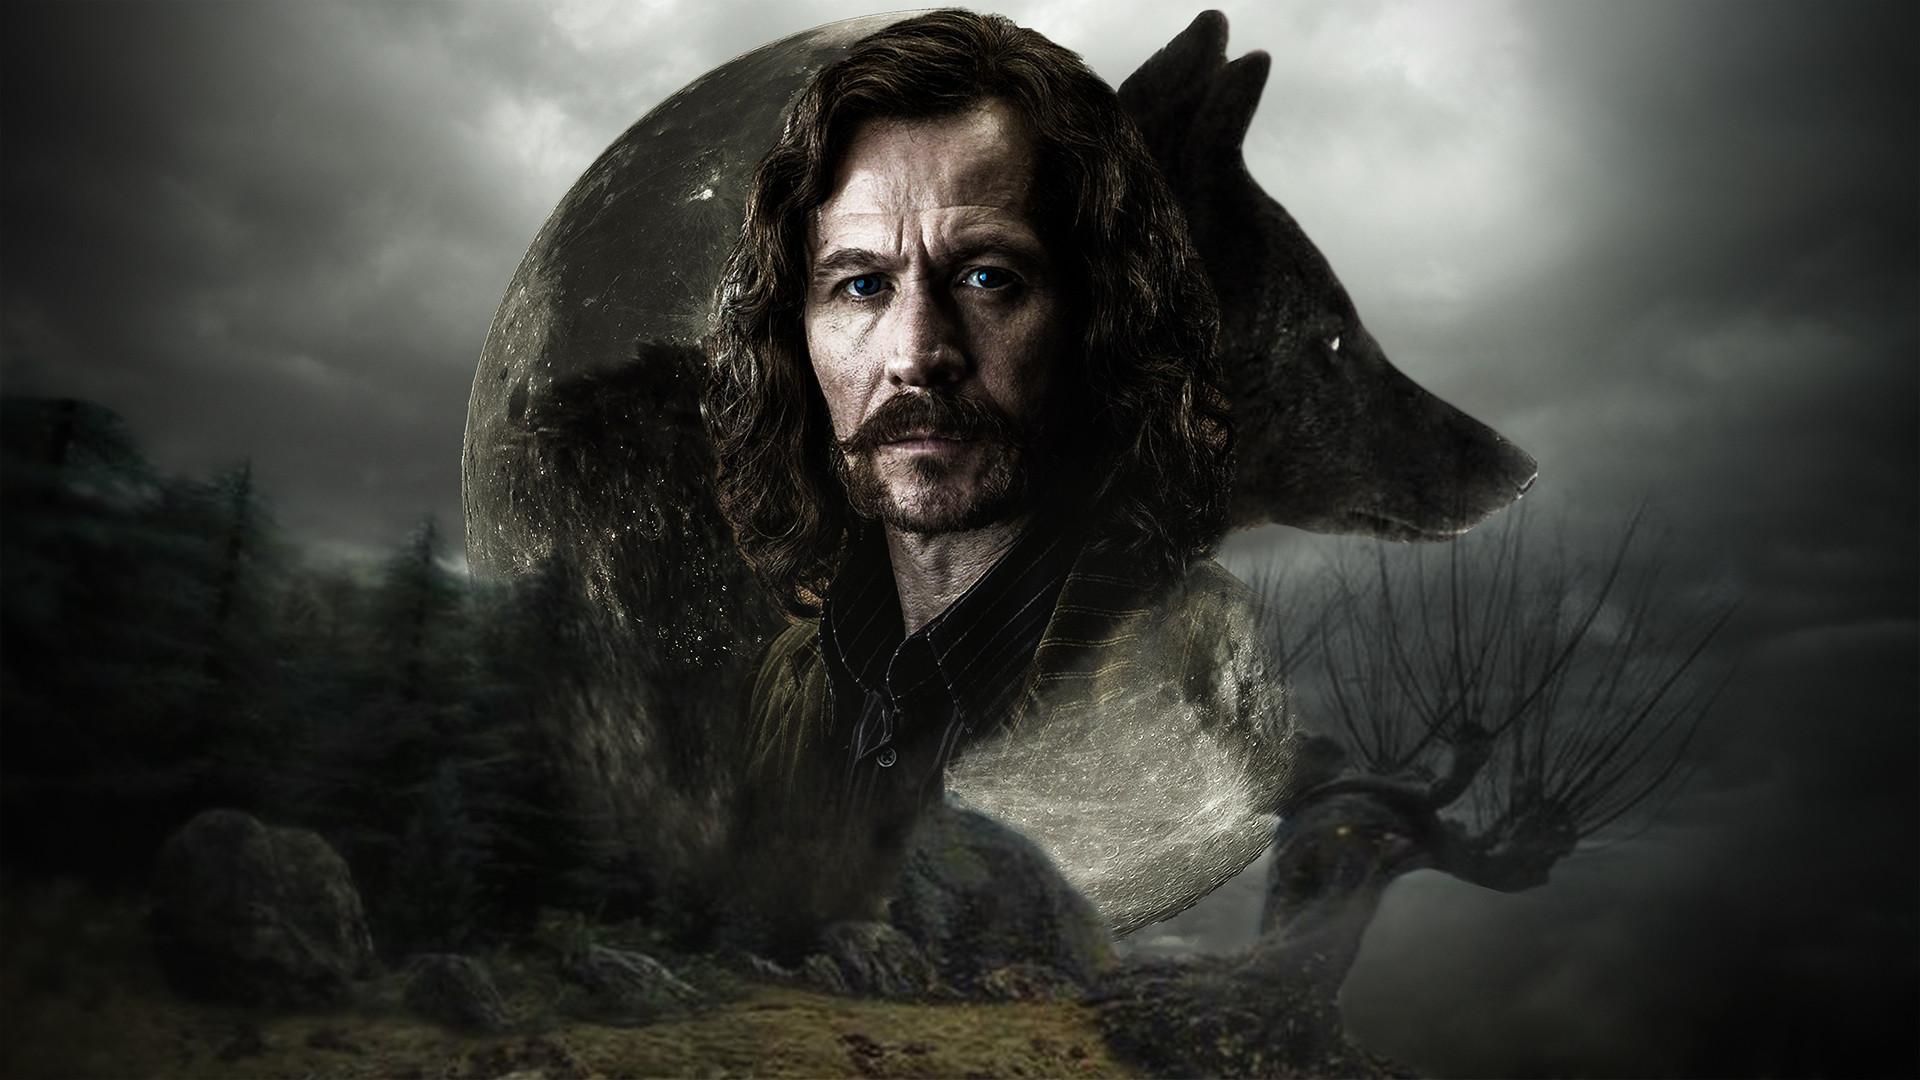 dark knight rises wallpaper download